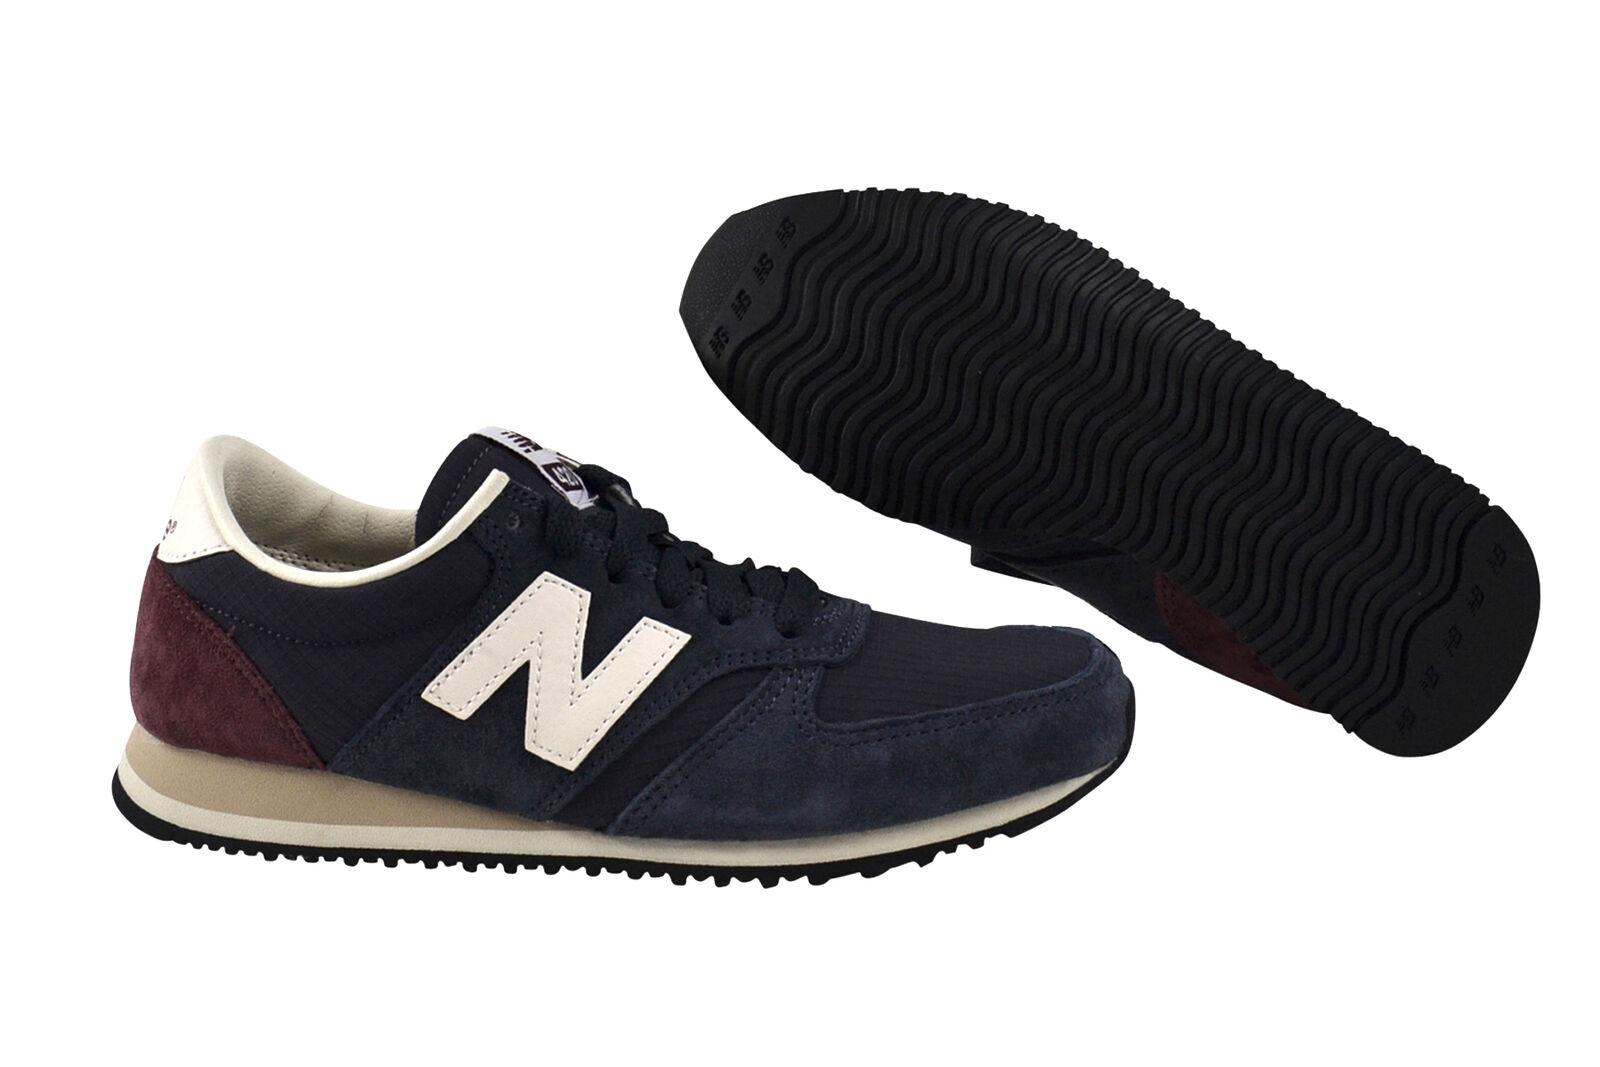 New balance u420 RNB Navy zapatos zapatillas azul